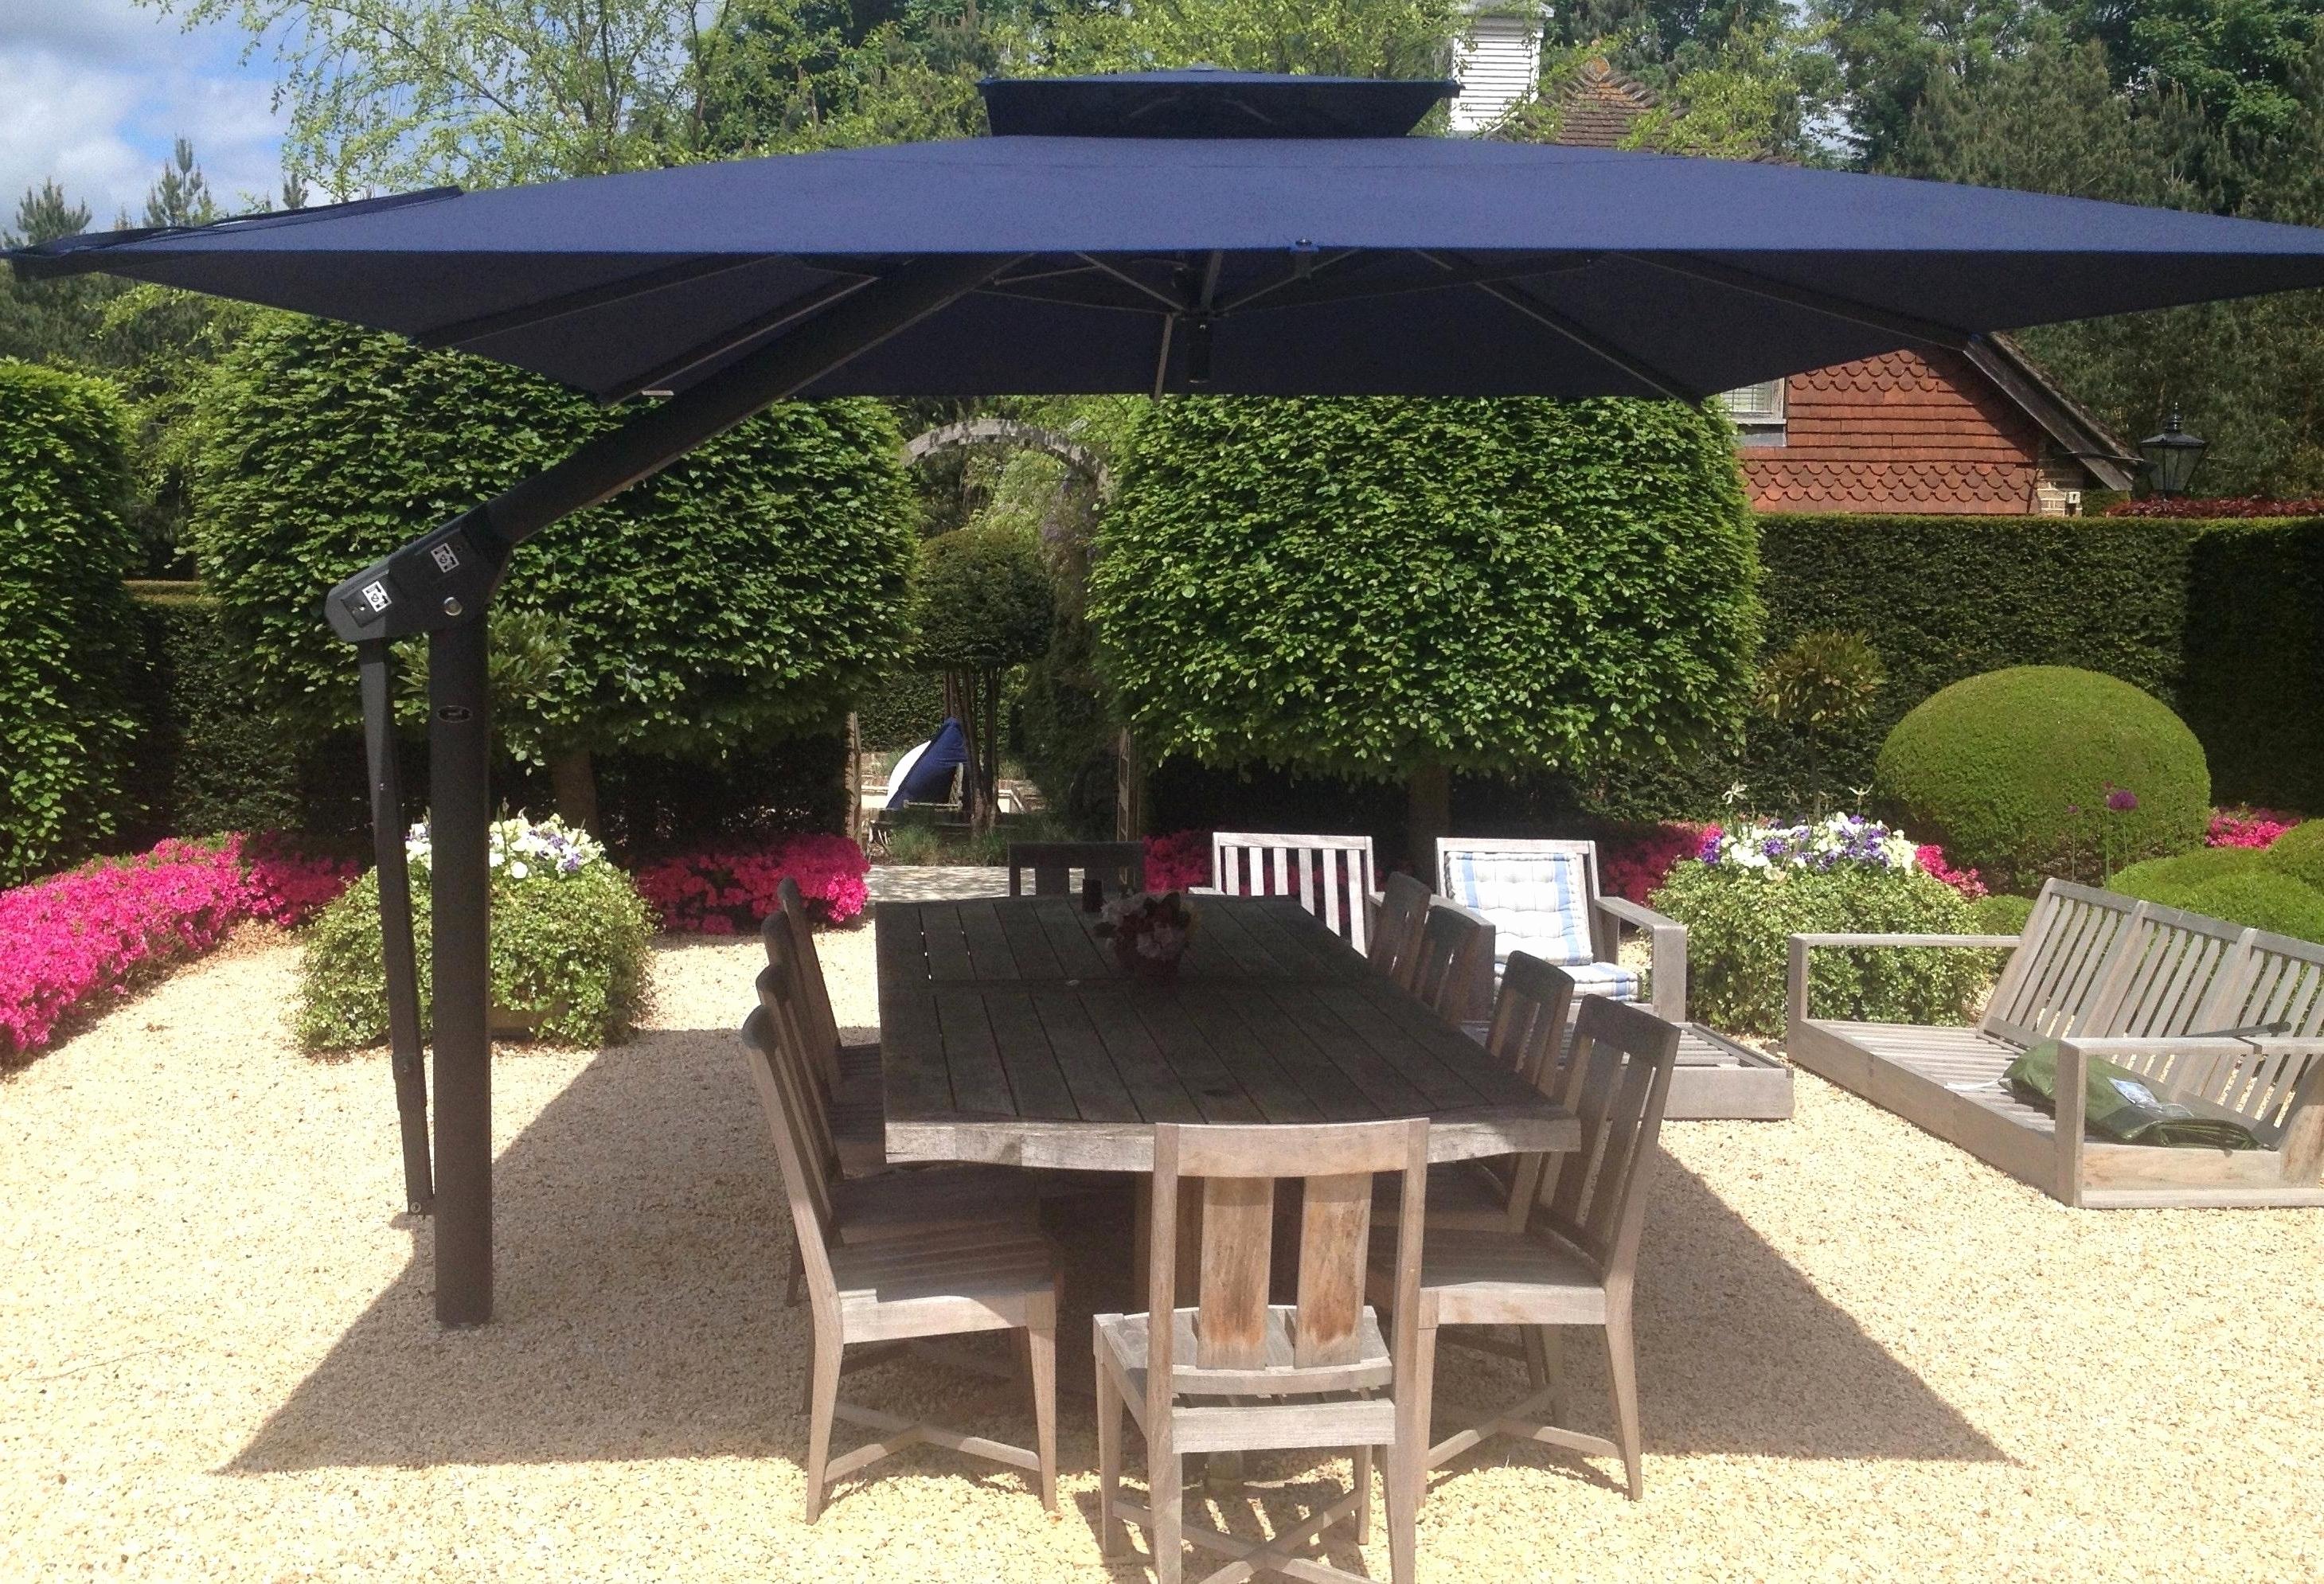 Small Patio Umbrella Part 2 Outdoor Umbrellas – Theestatesga Pertaining To 2019 Small Patio Umbrellas (View 4 of 20)